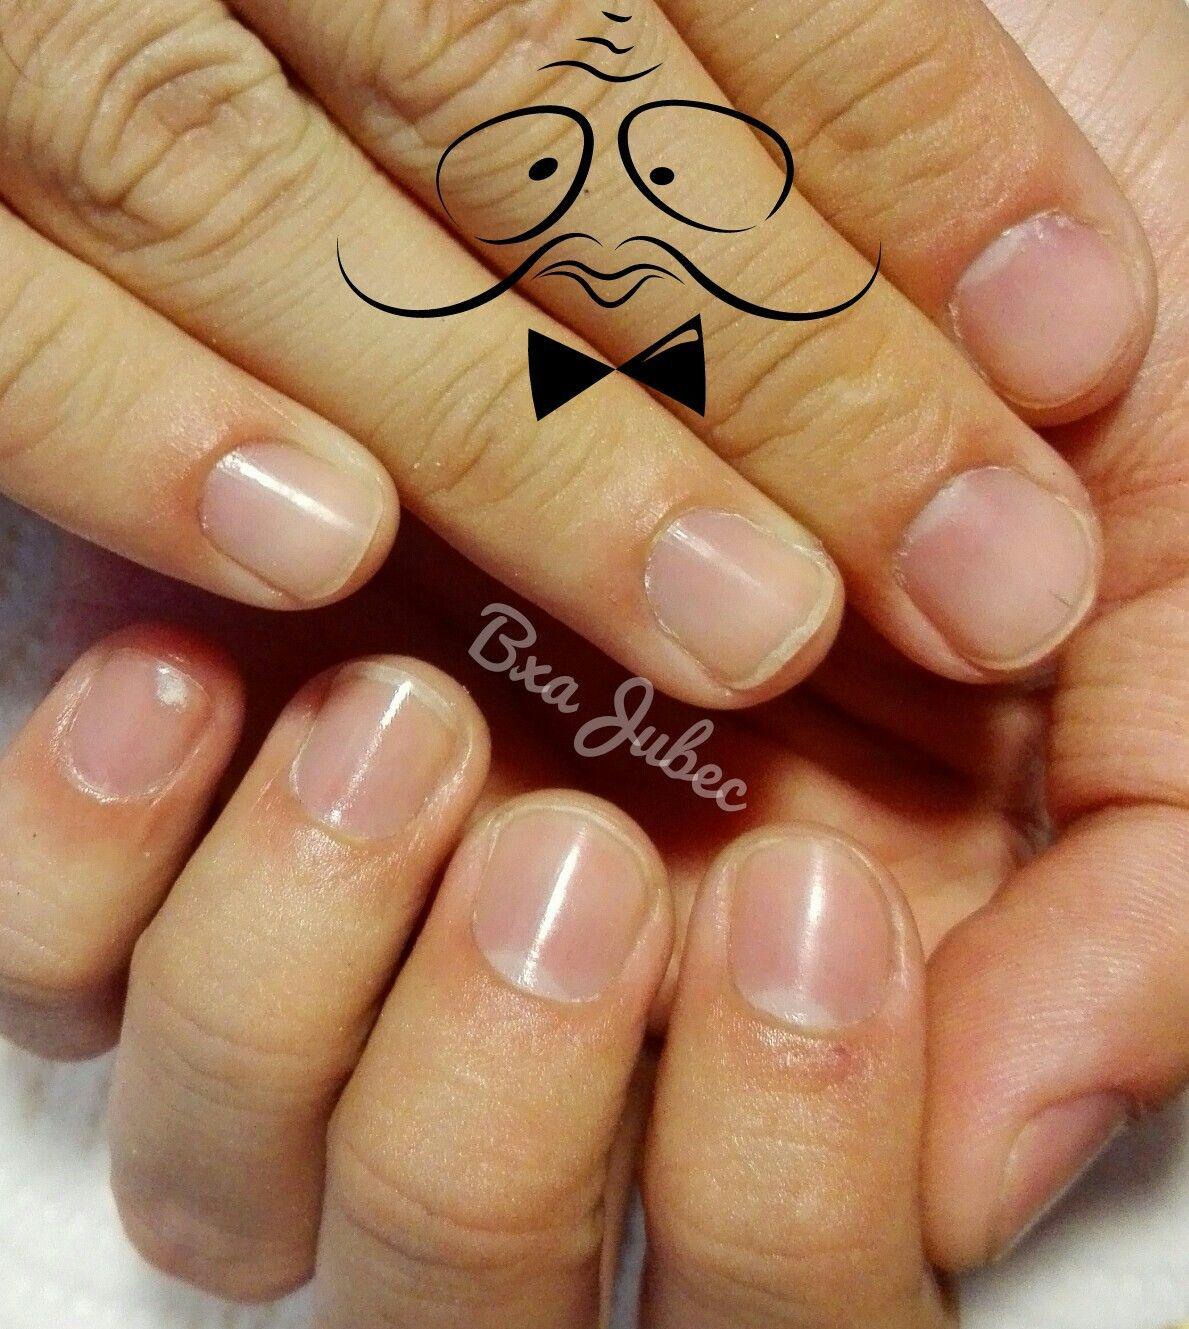 Manicura hombre | uñas Betsa Jubec | Pinterest | Manicuras